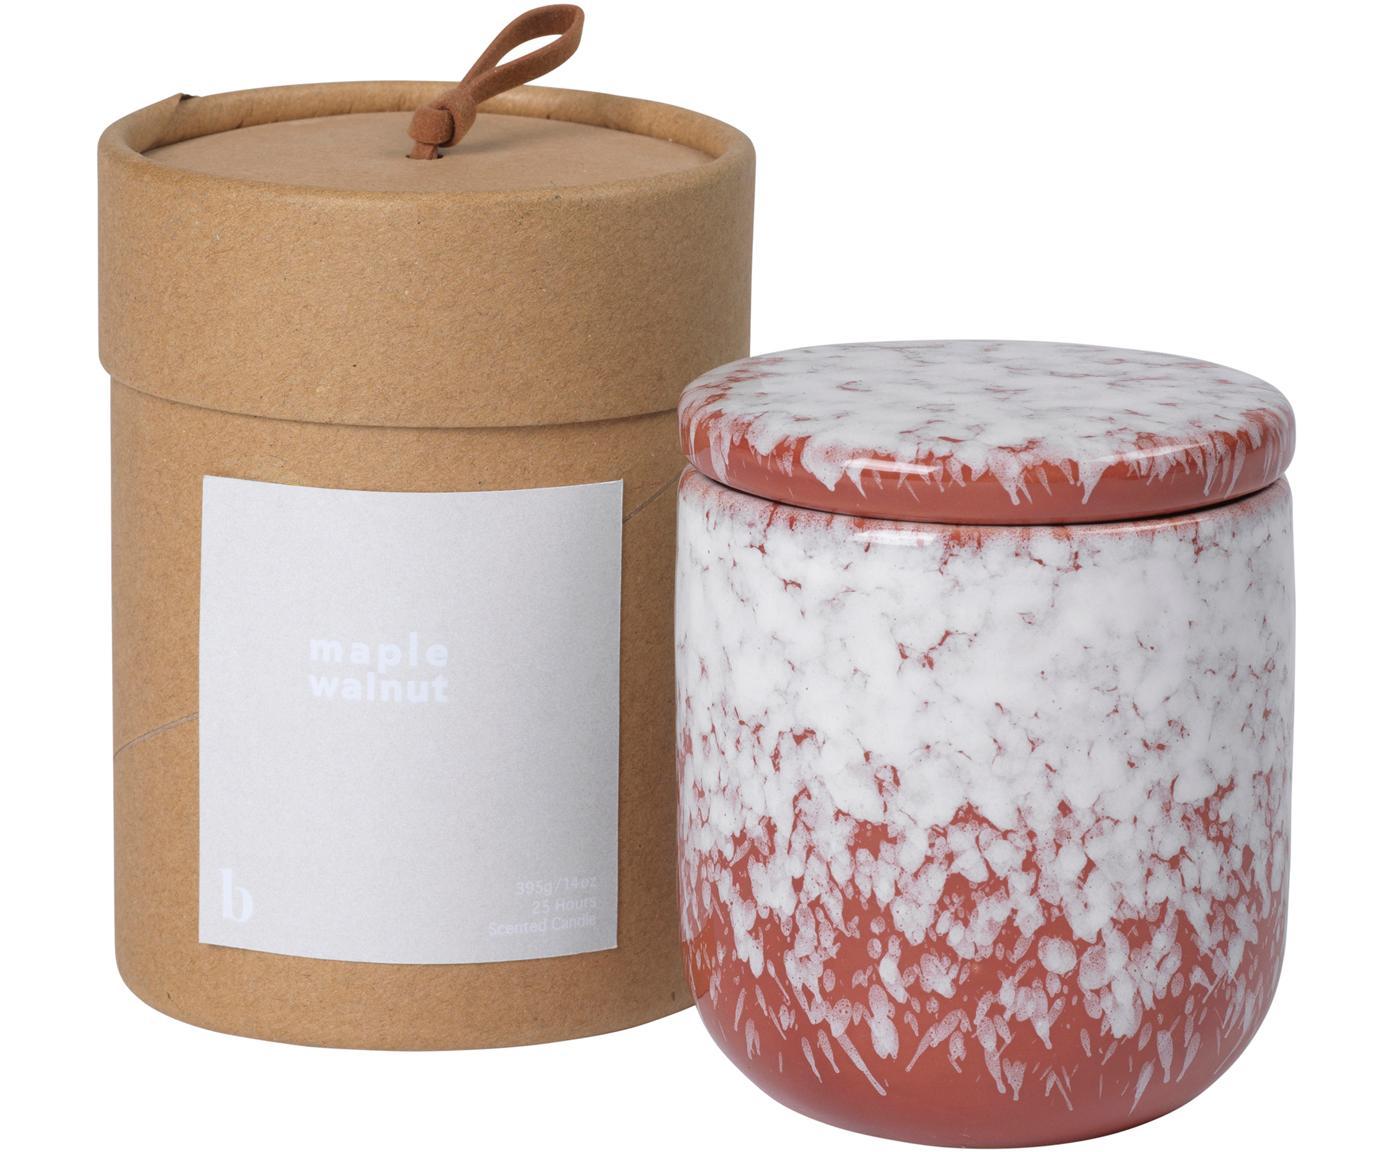 Geurkaars Maple Walnut, Houder: keramiek, Rood, wit, Ø 8 cm